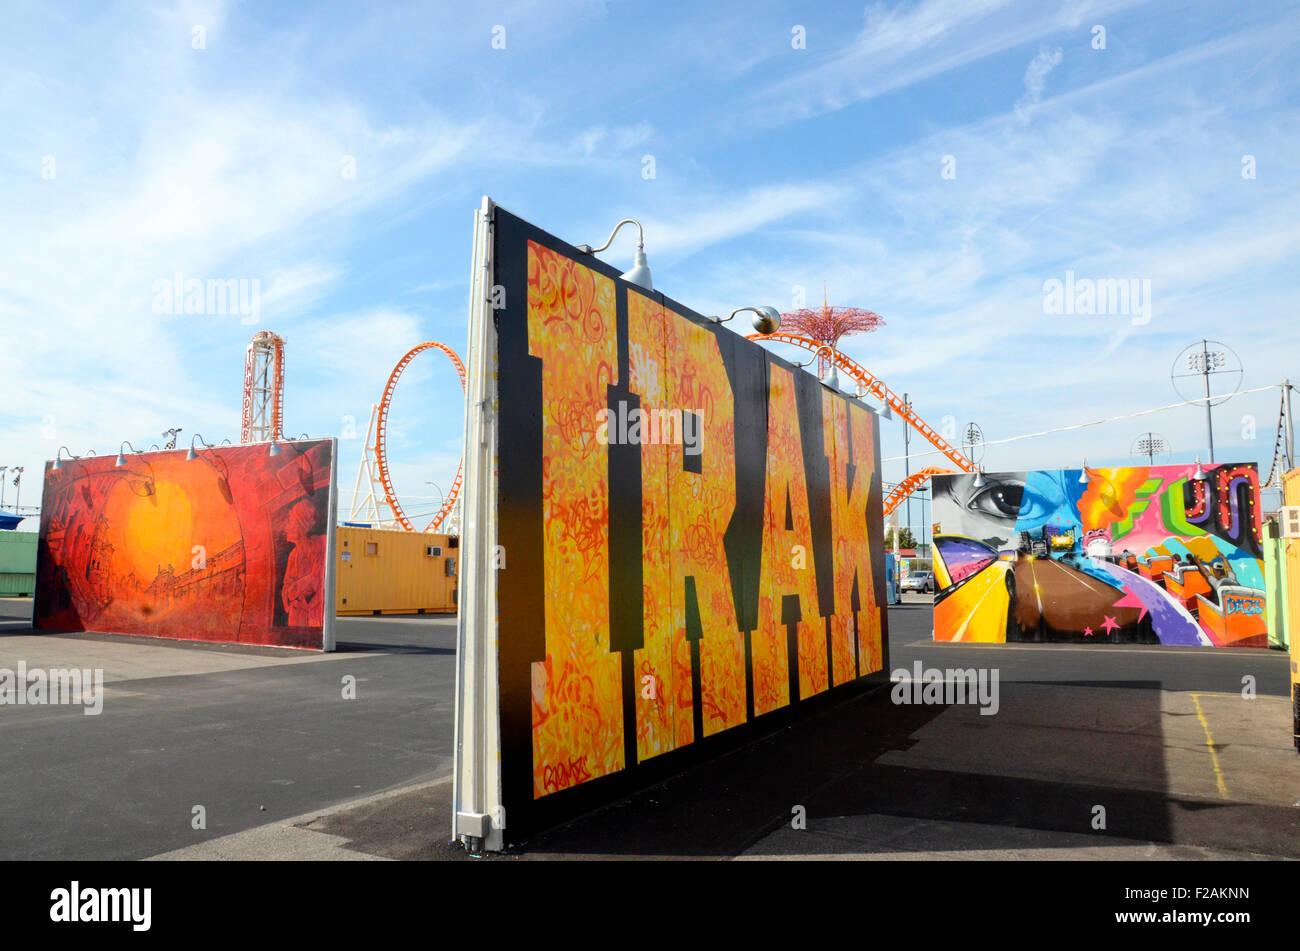 irak coney art walls coney island brooklyn - Stock Image